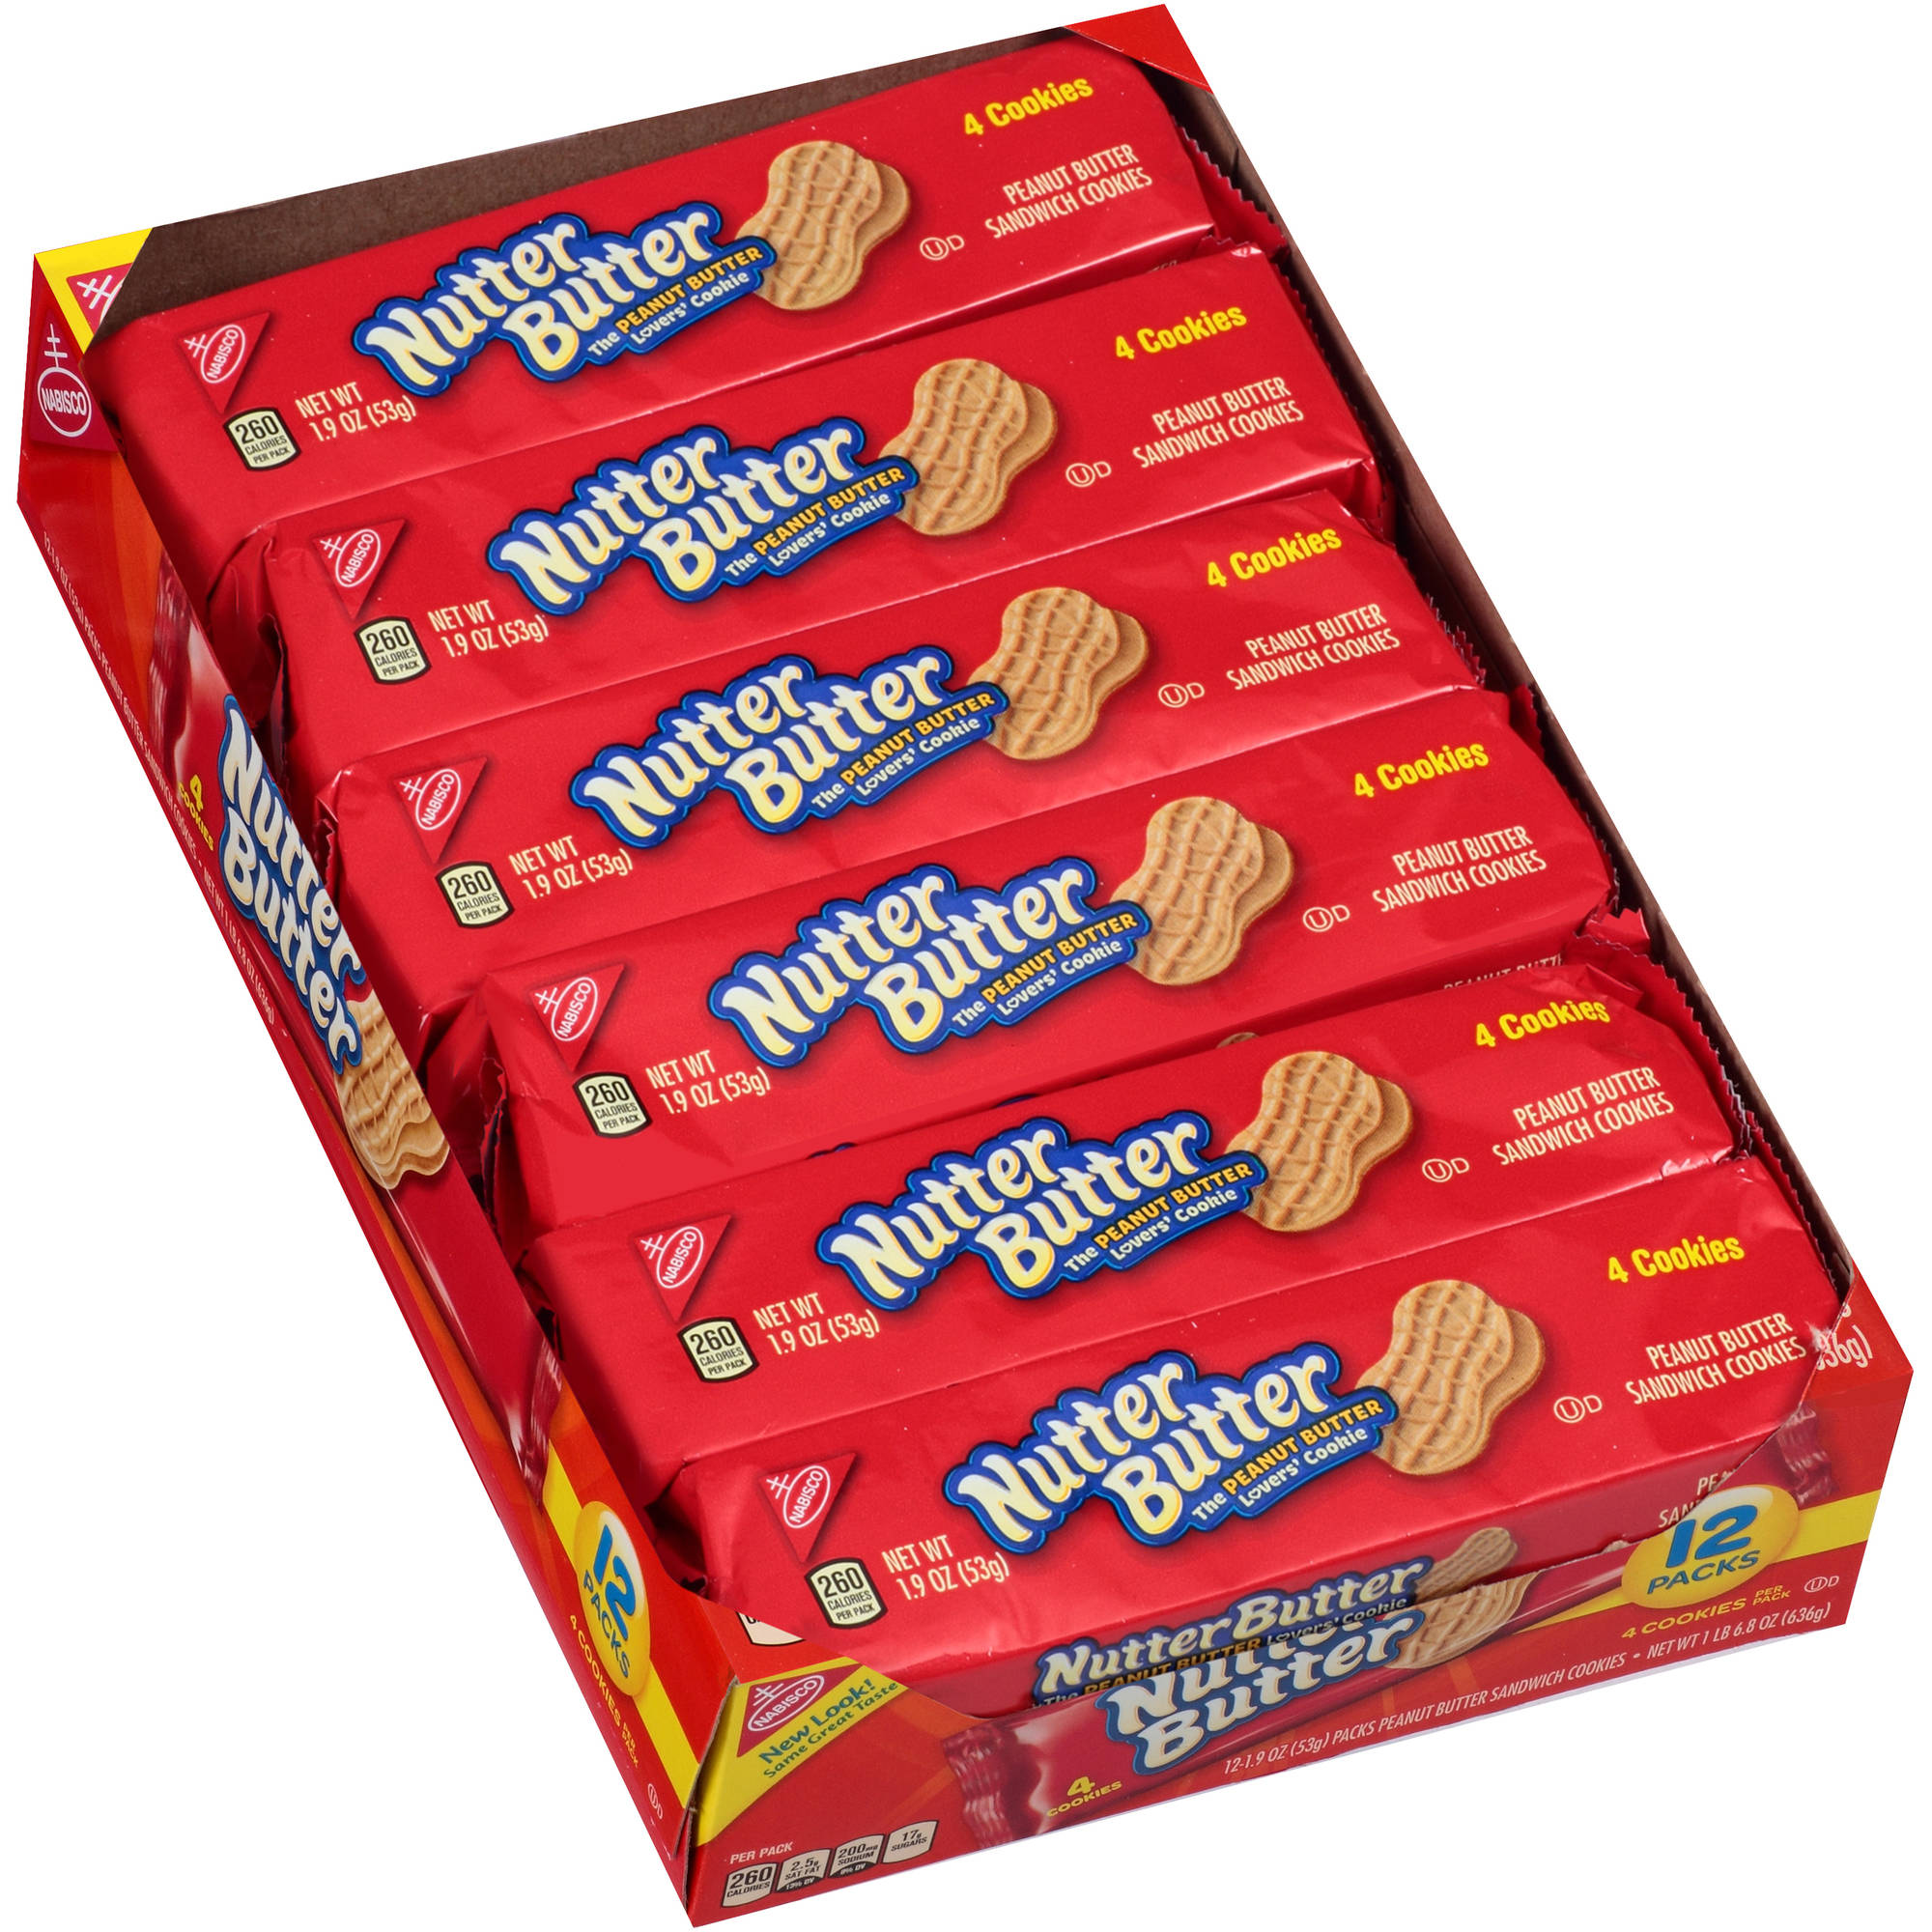 Nabisco Nutter Butter Peanut Butter Cookies, 12ct